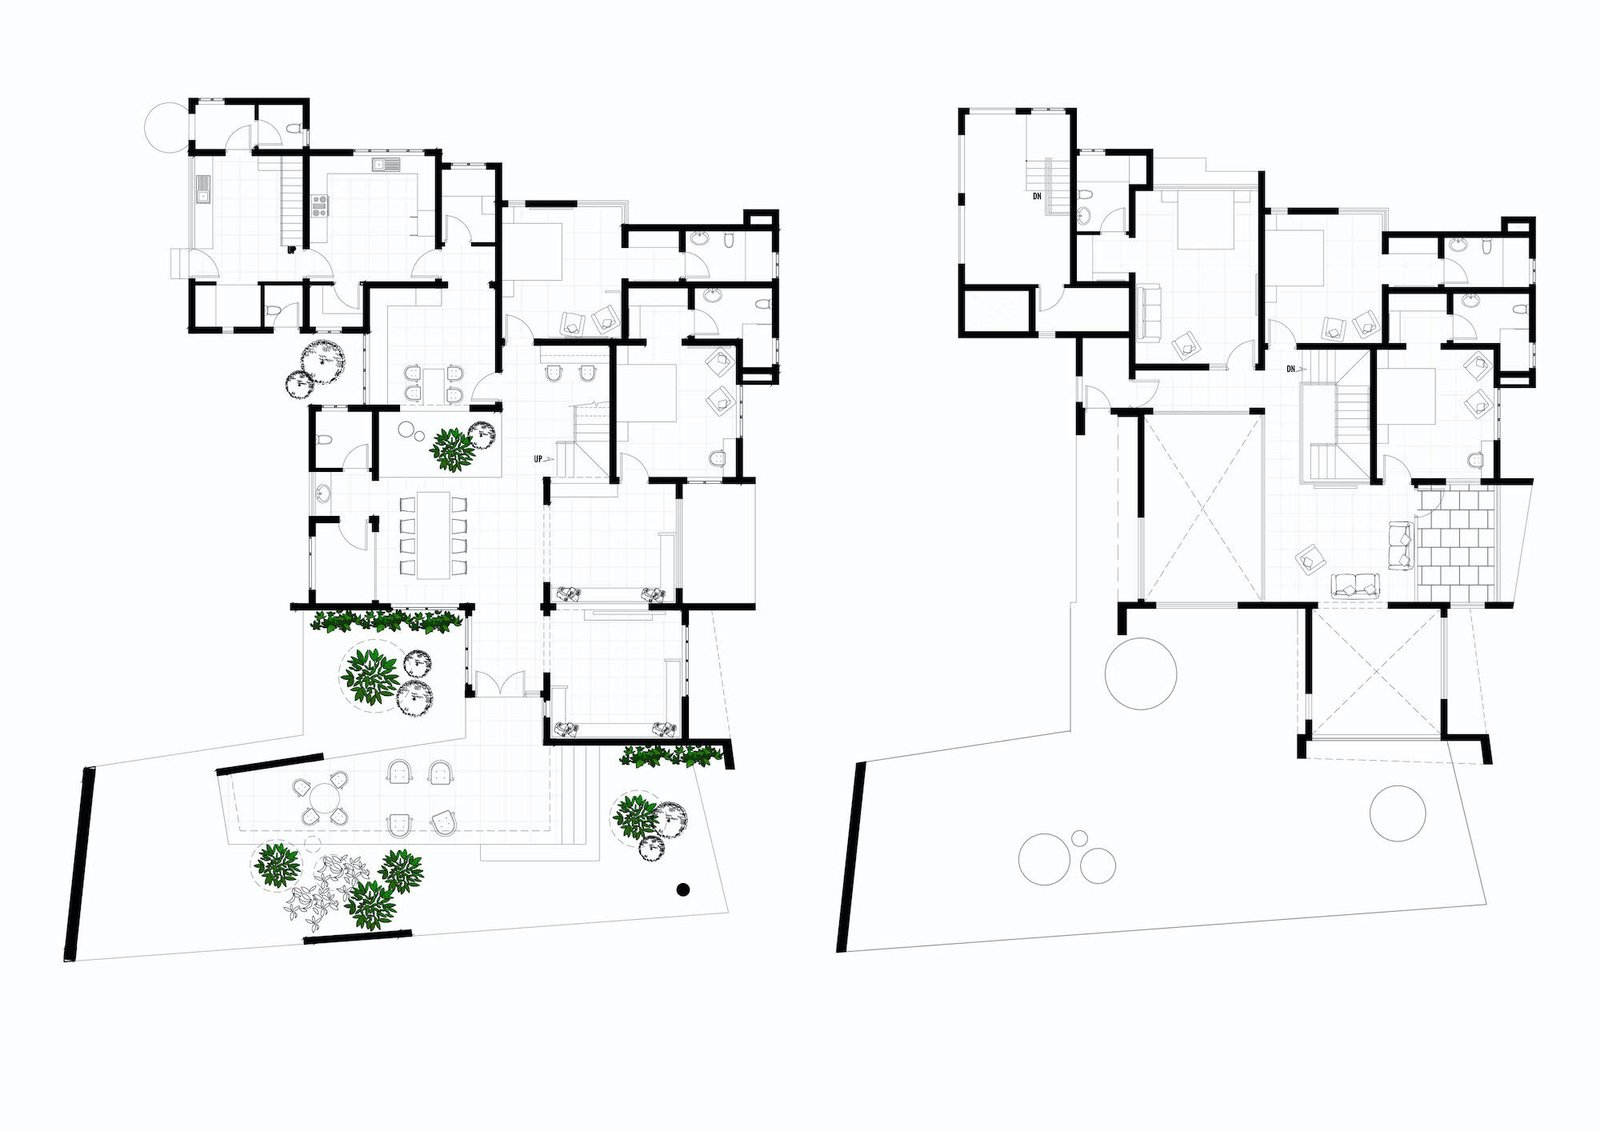 Floor plans of Pakhaniyil Residence by Nufail Shabana Architects